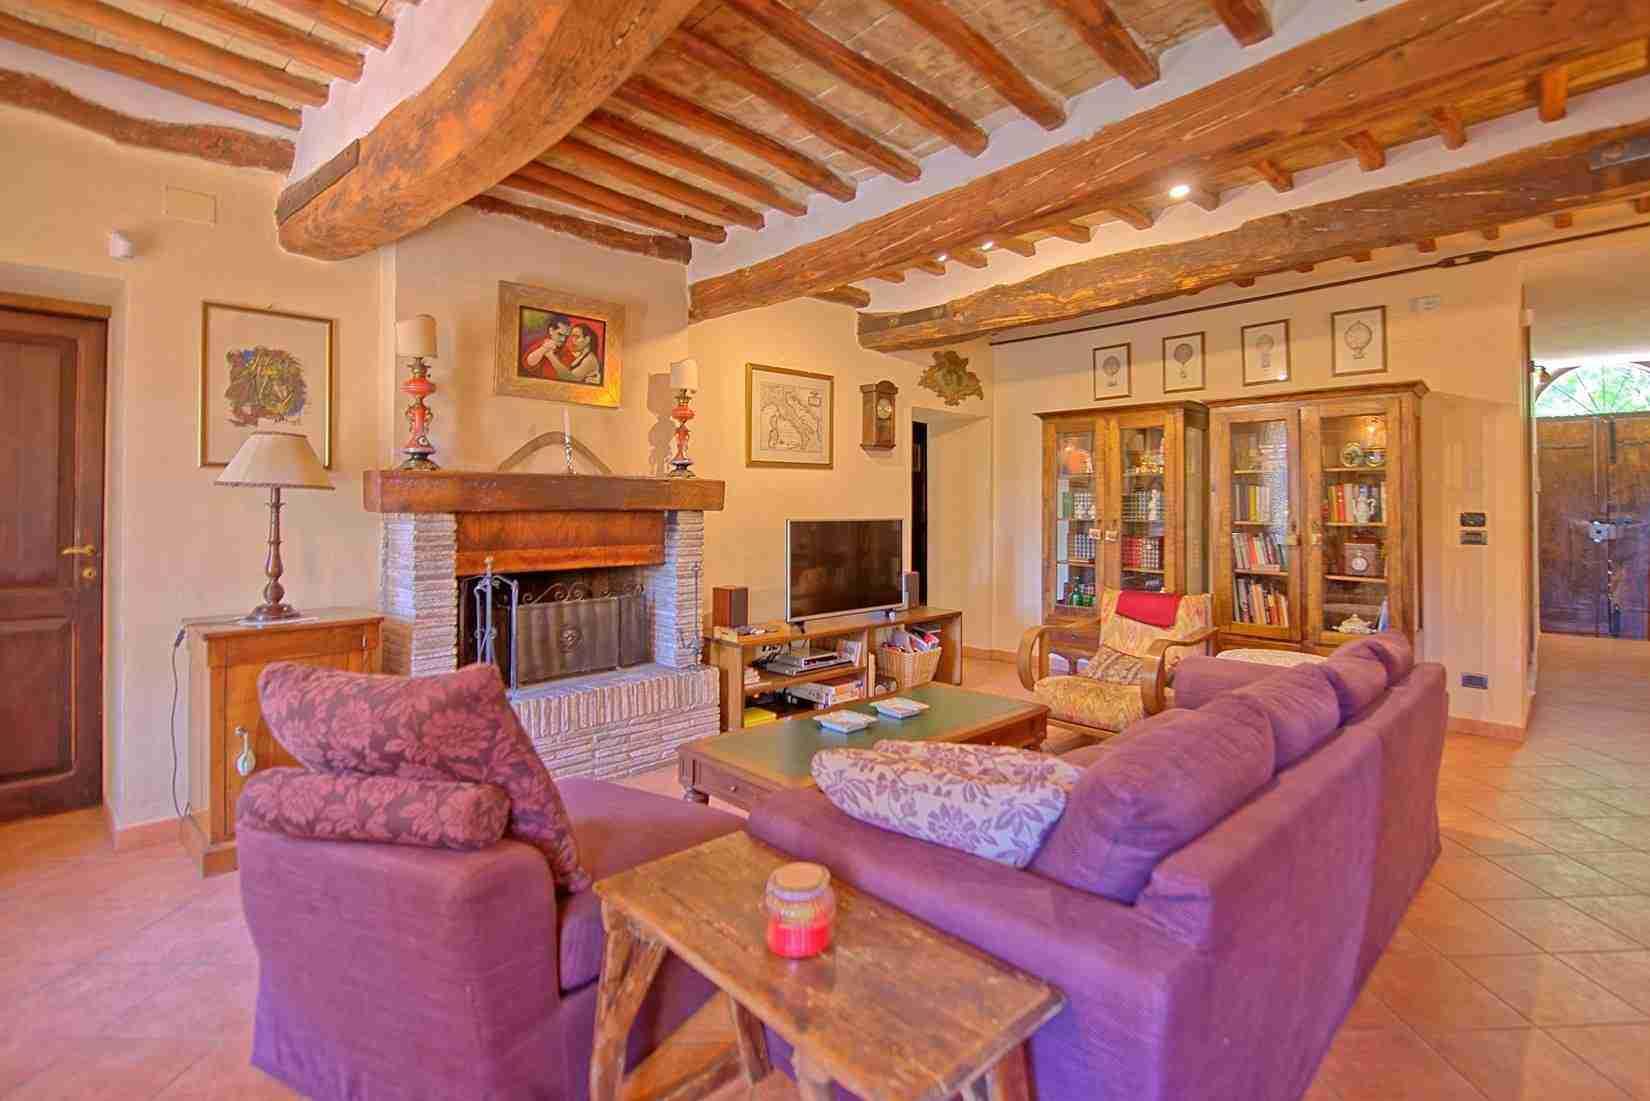 9 Clara living room